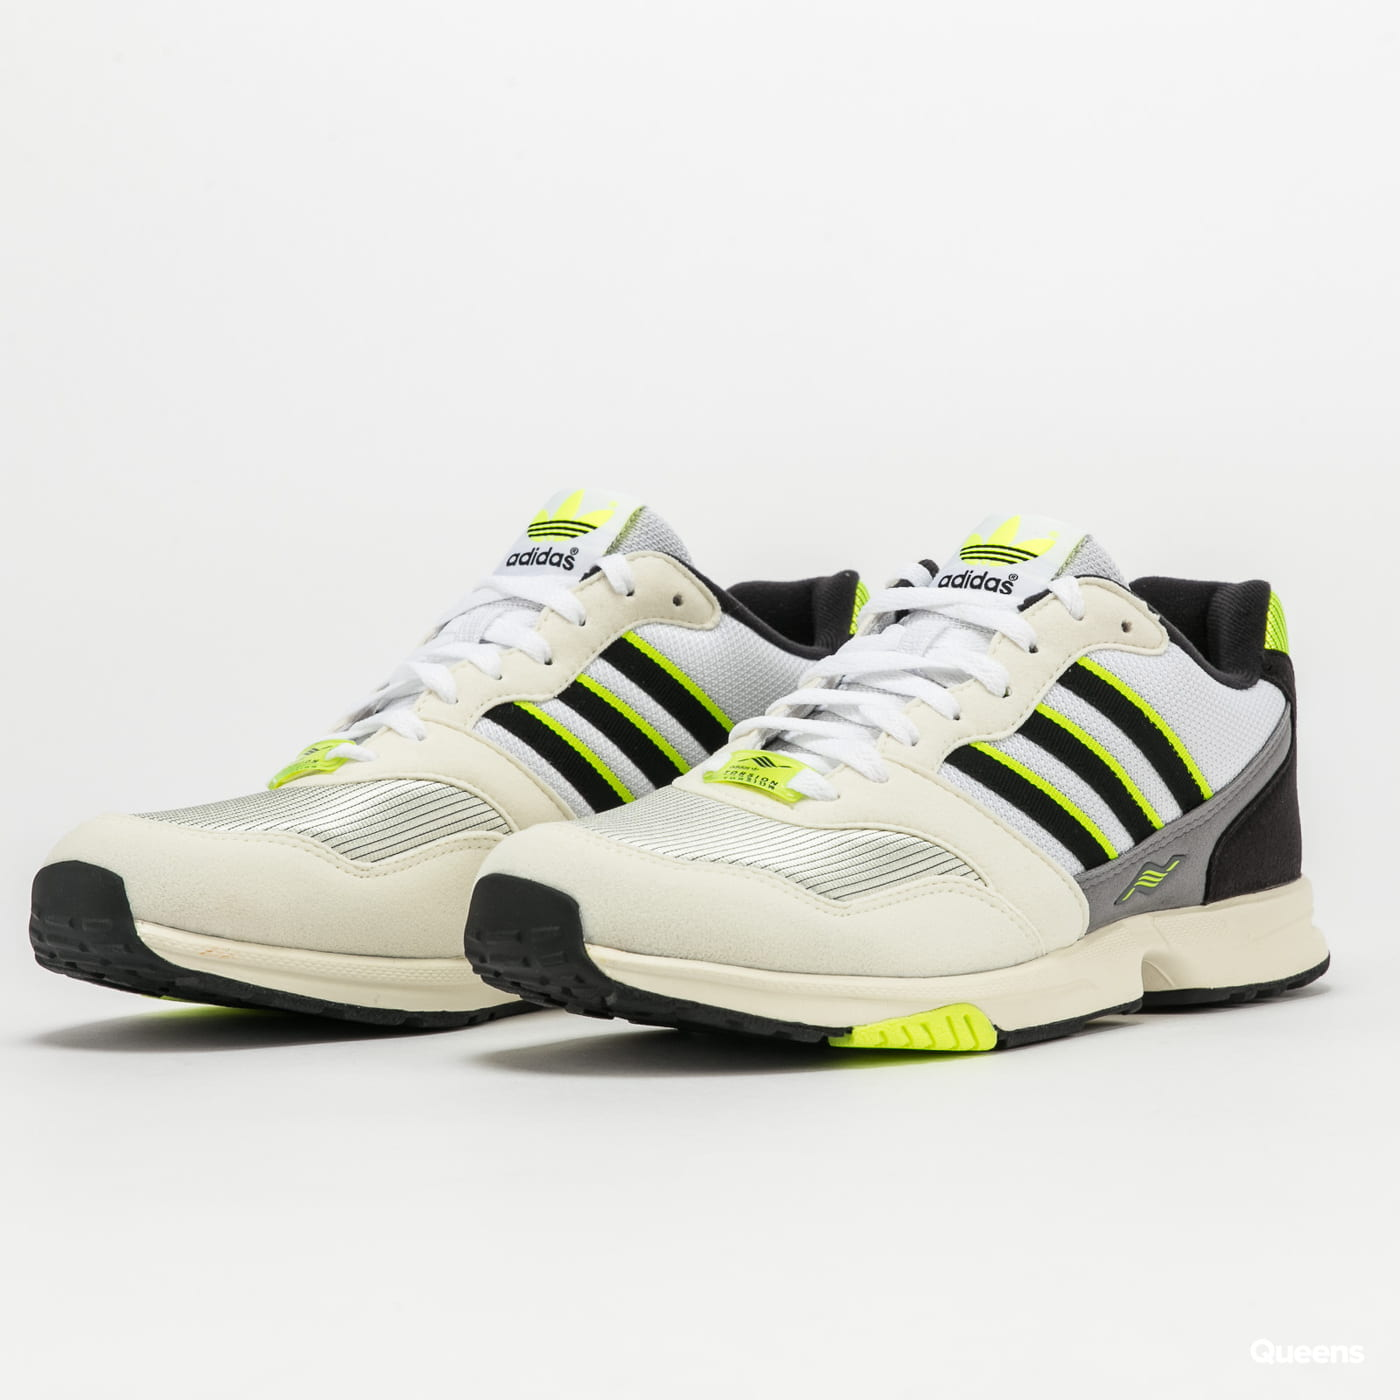 adidas Originals ZX 1000 C owhite / cblack / ftwwht